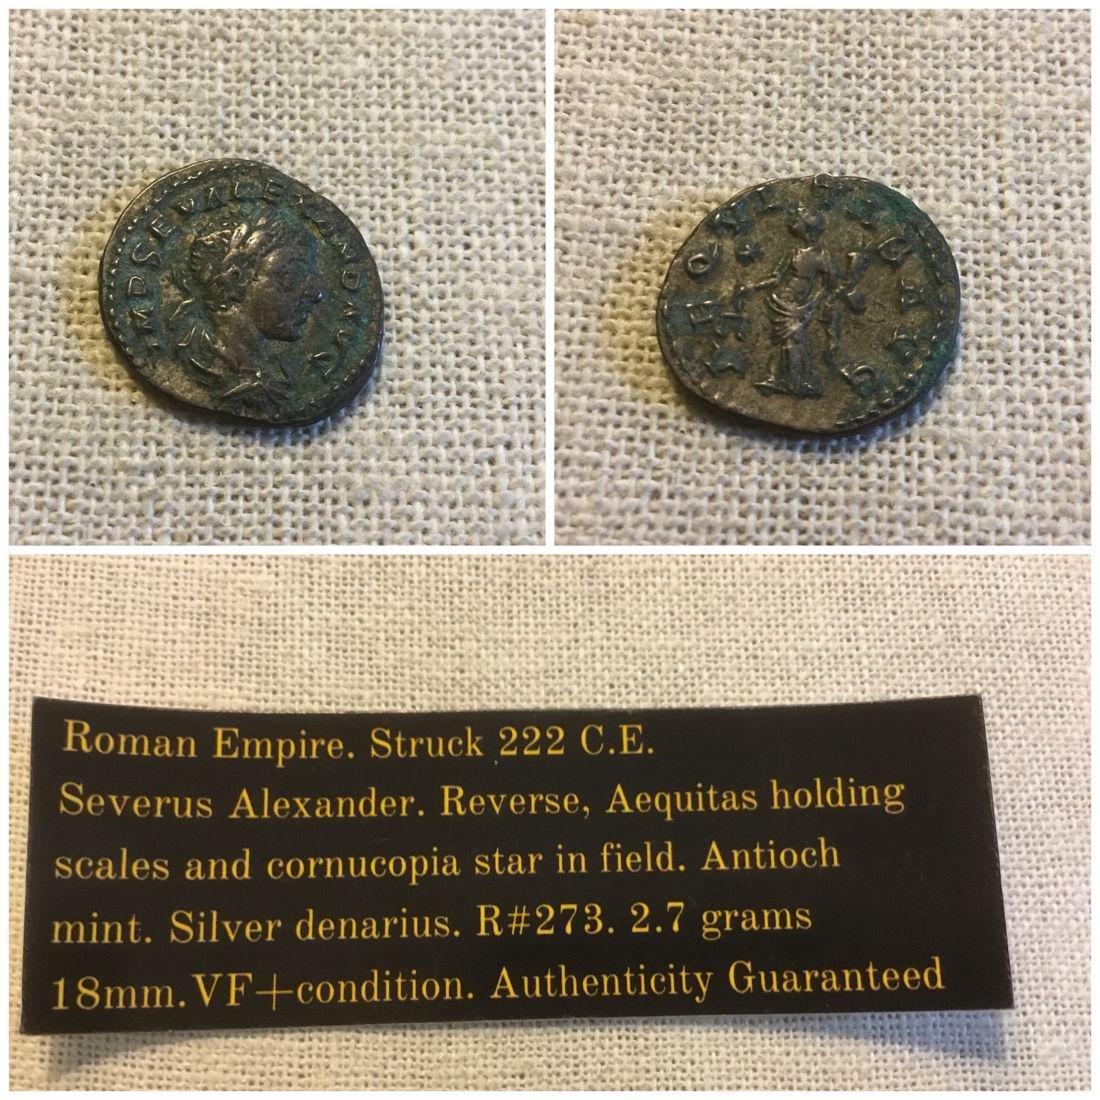 Roman Empire denarius. Severus Alexander 222 C.E. - 2